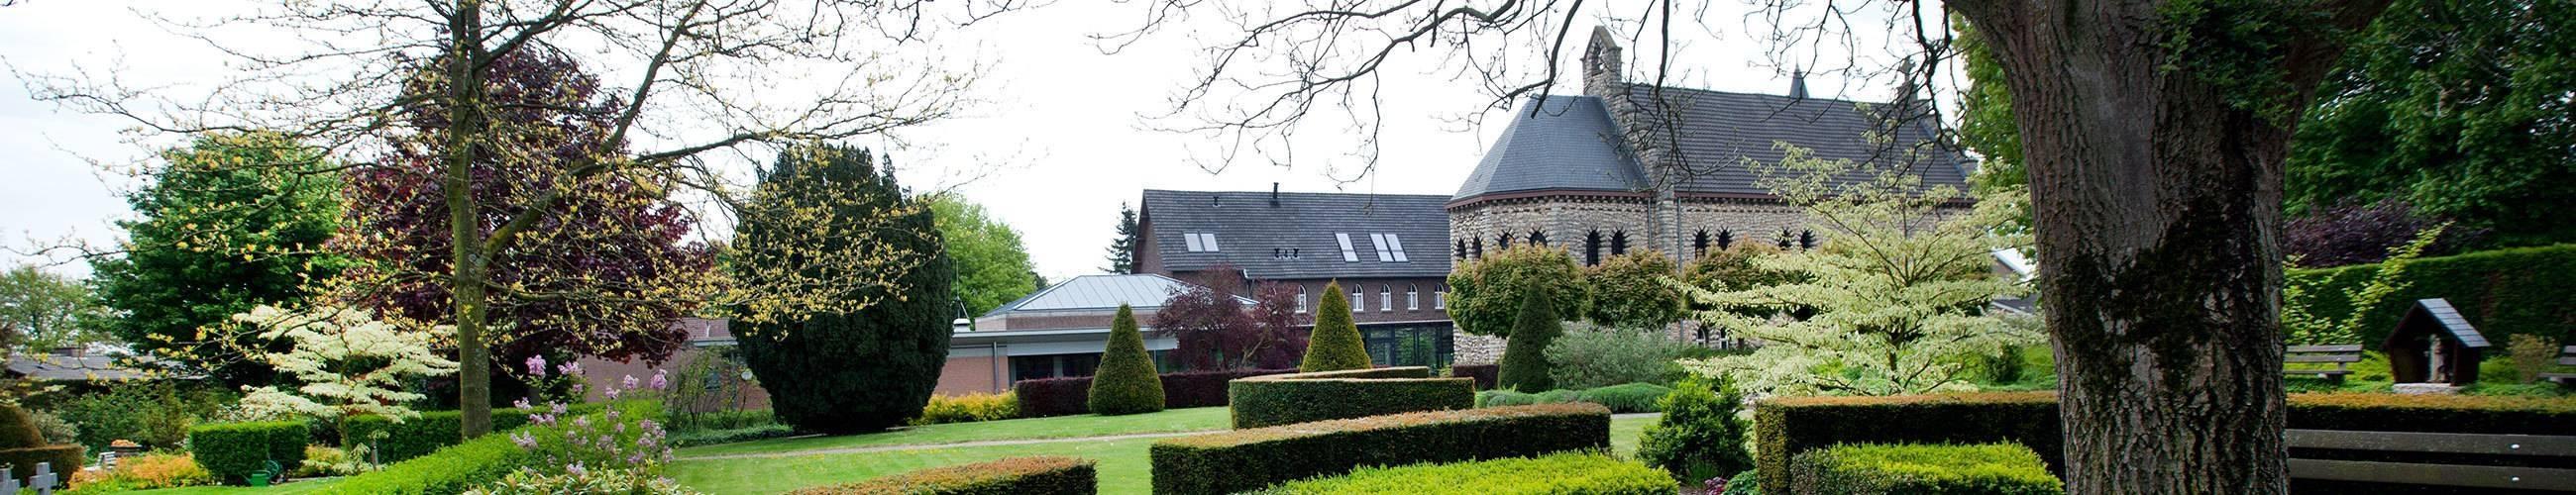 Zorgcentrum Huize d'Alzon, Hulsberg